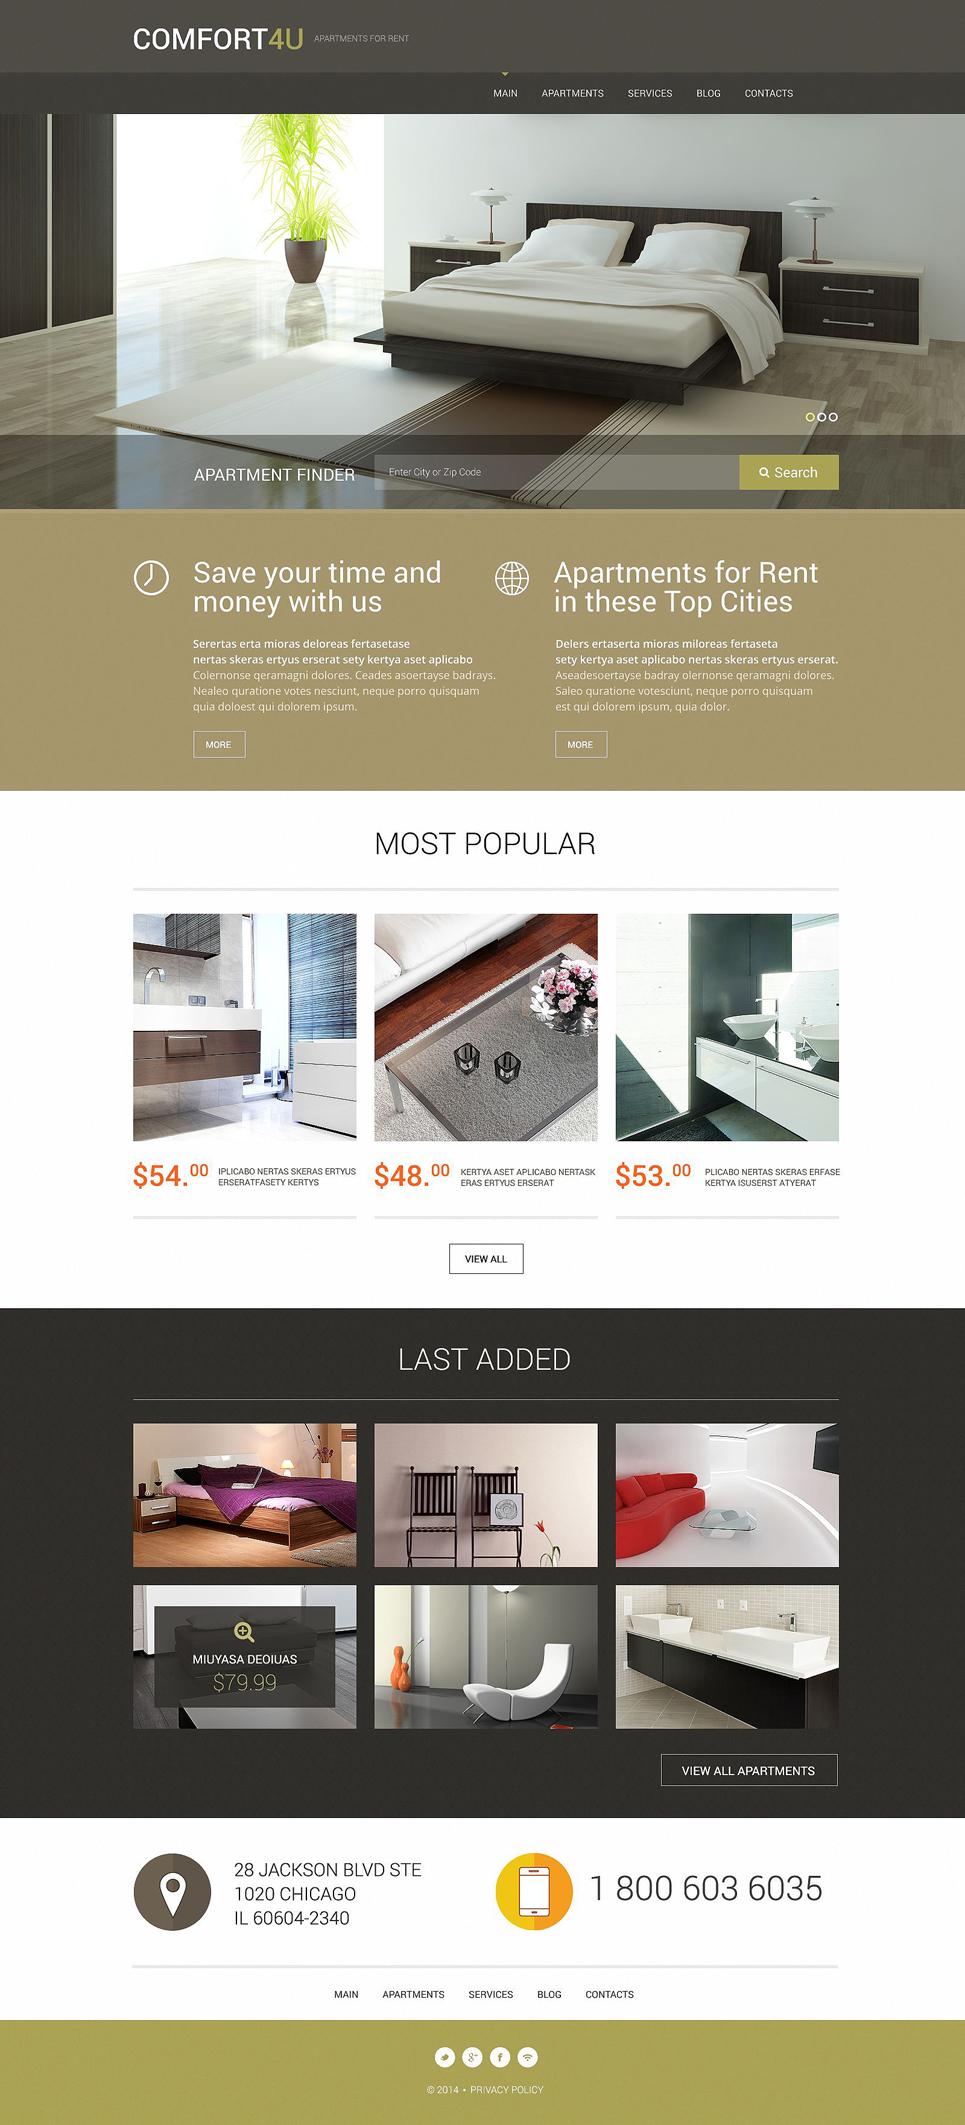 Адаптивный шаблон сайта на тему агентство недвижимости #52294